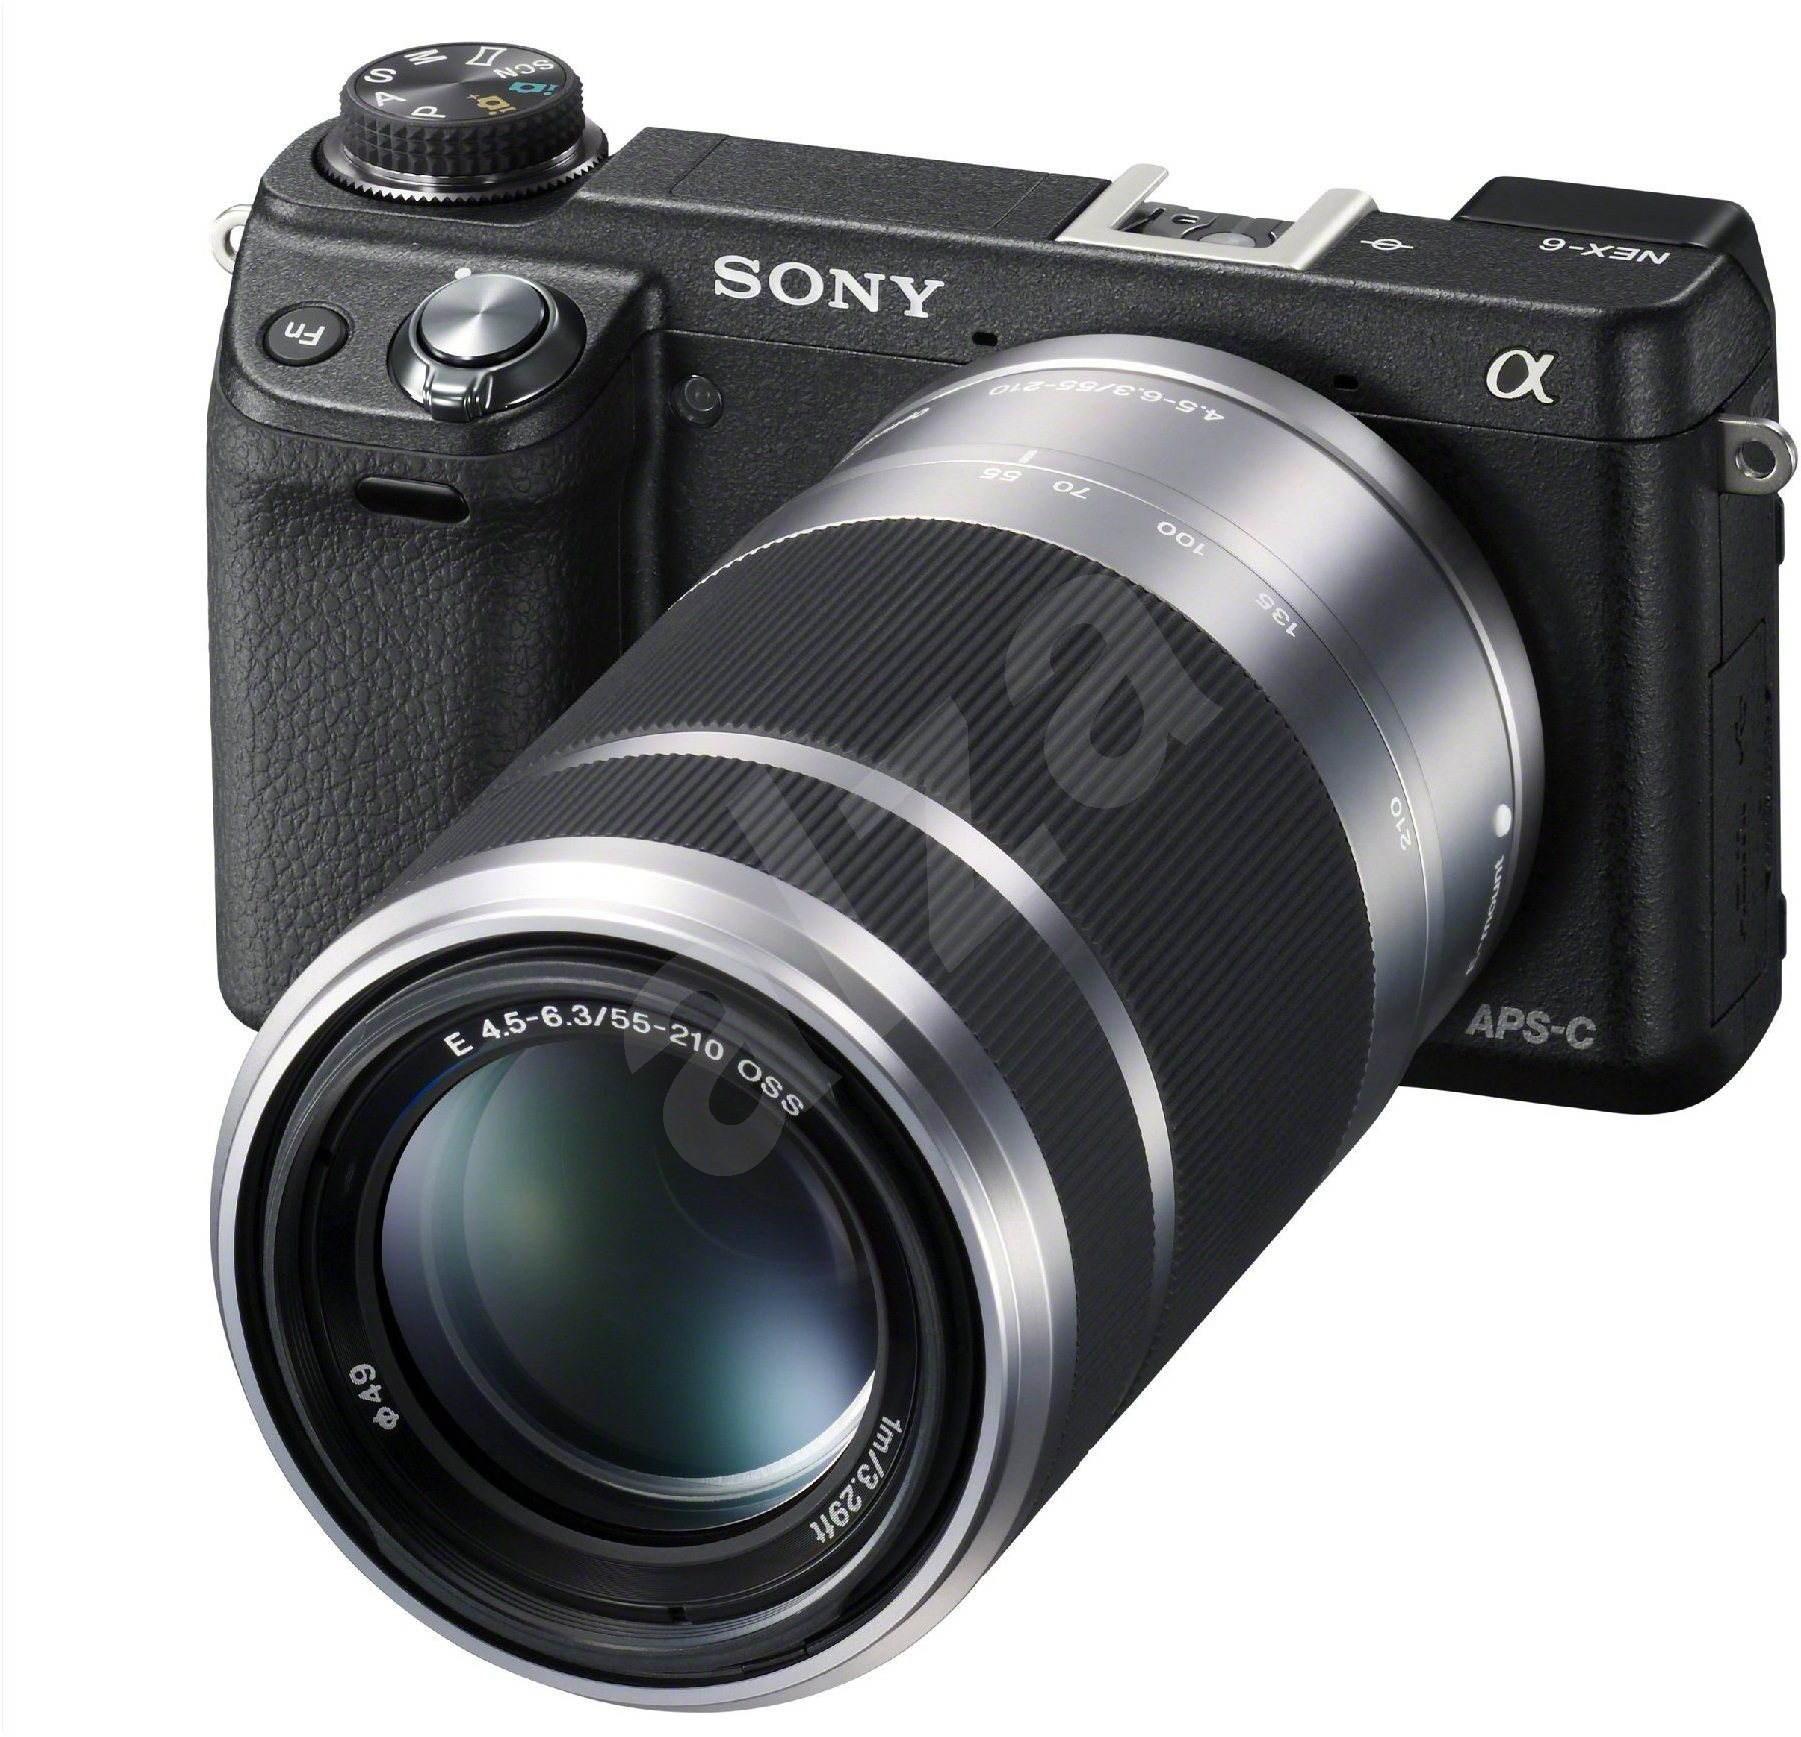 sony nex 6y 2 lenses 16 50mm a 55 210 mm digital camera. Black Bedroom Furniture Sets. Home Design Ideas